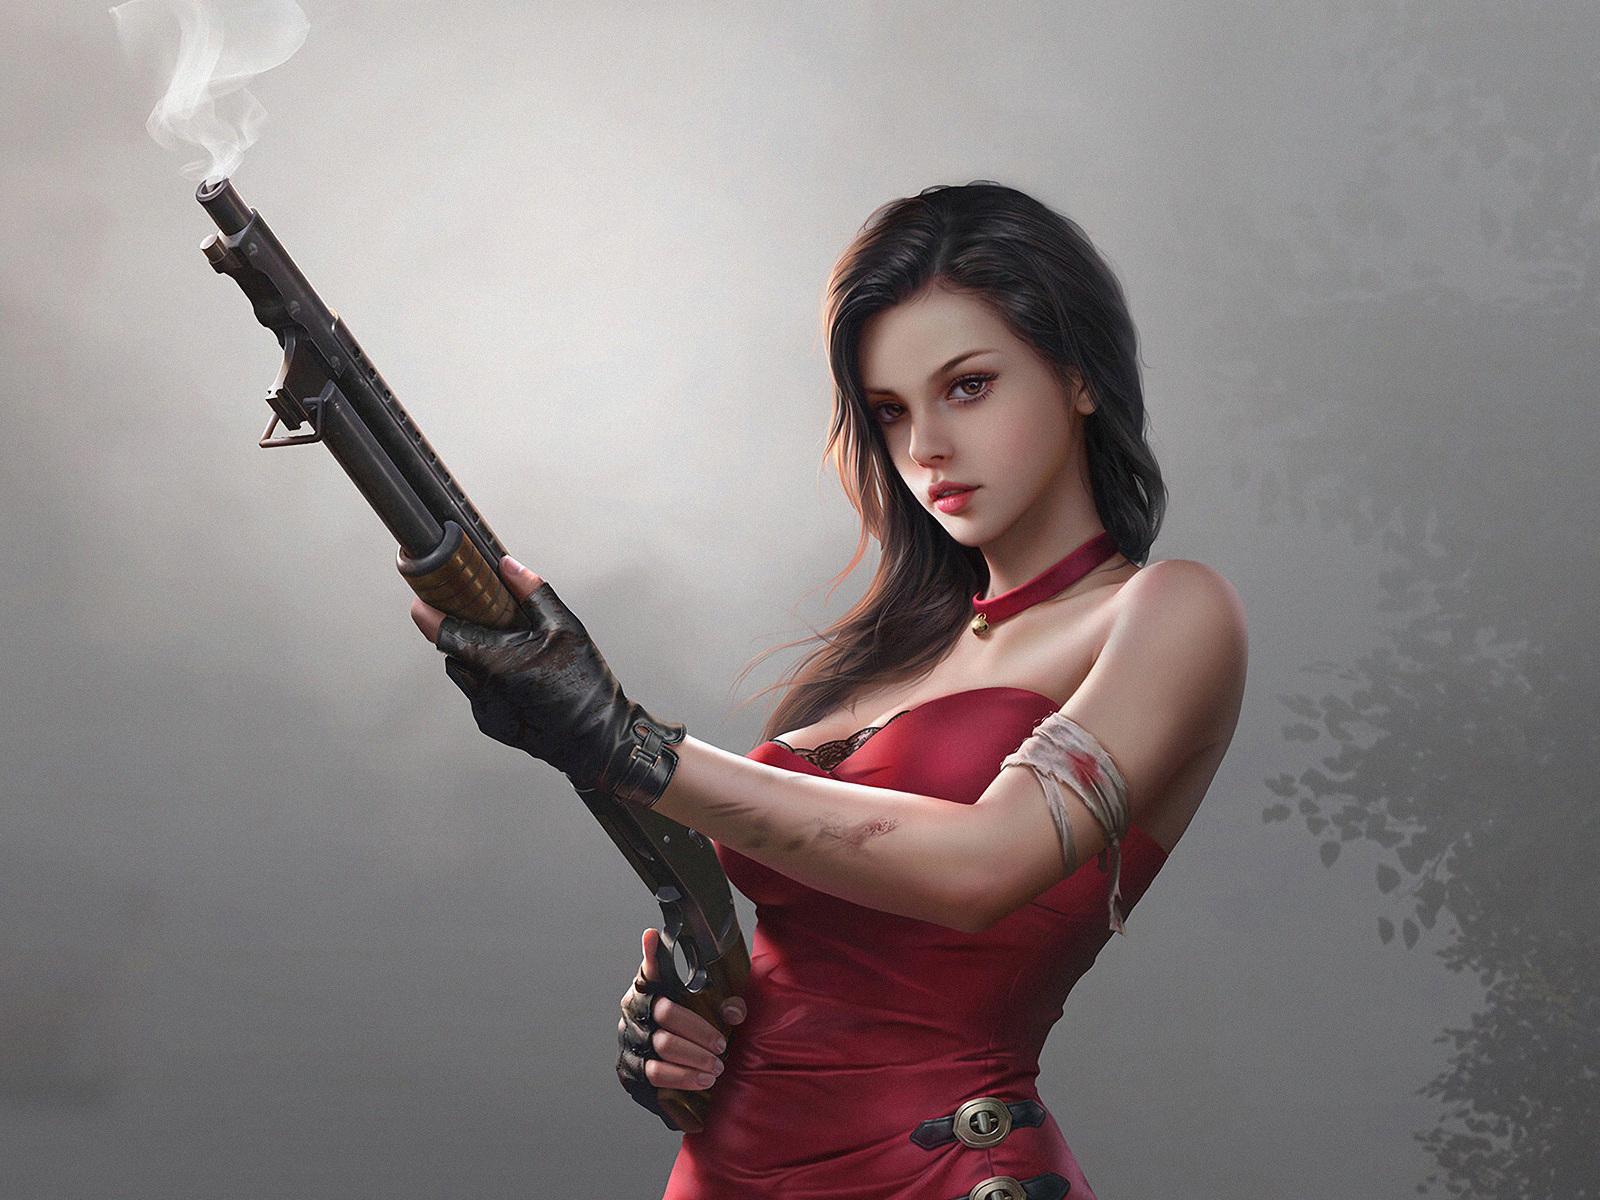 fantasy-girl-in-red-dress-with-gun-4k-lg.jpg